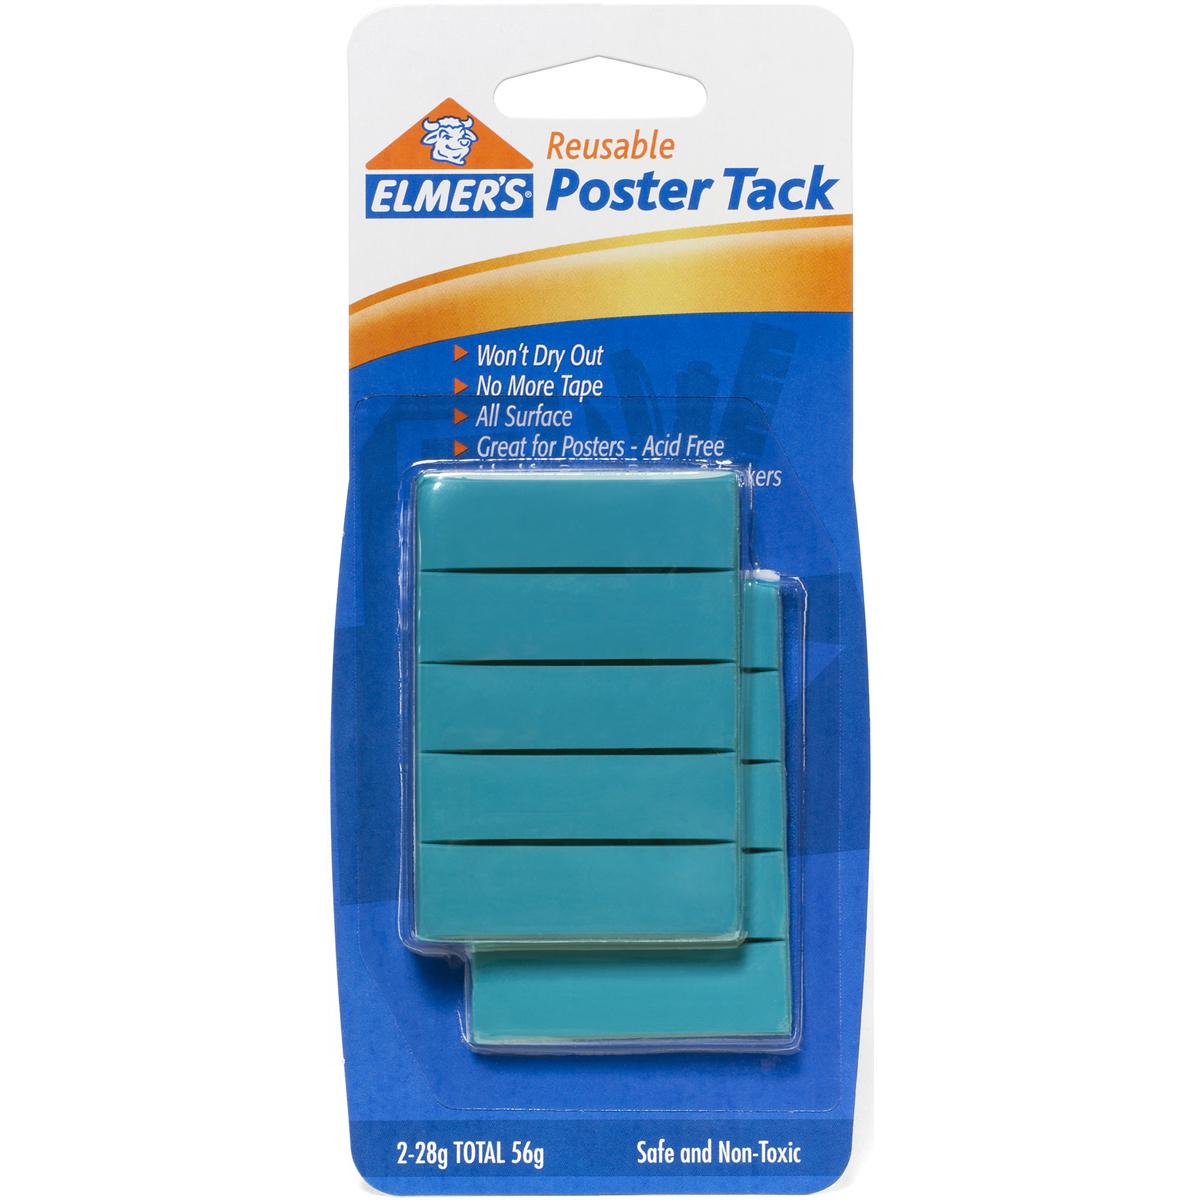 Elmer's Reusable Poster Tack-2oz